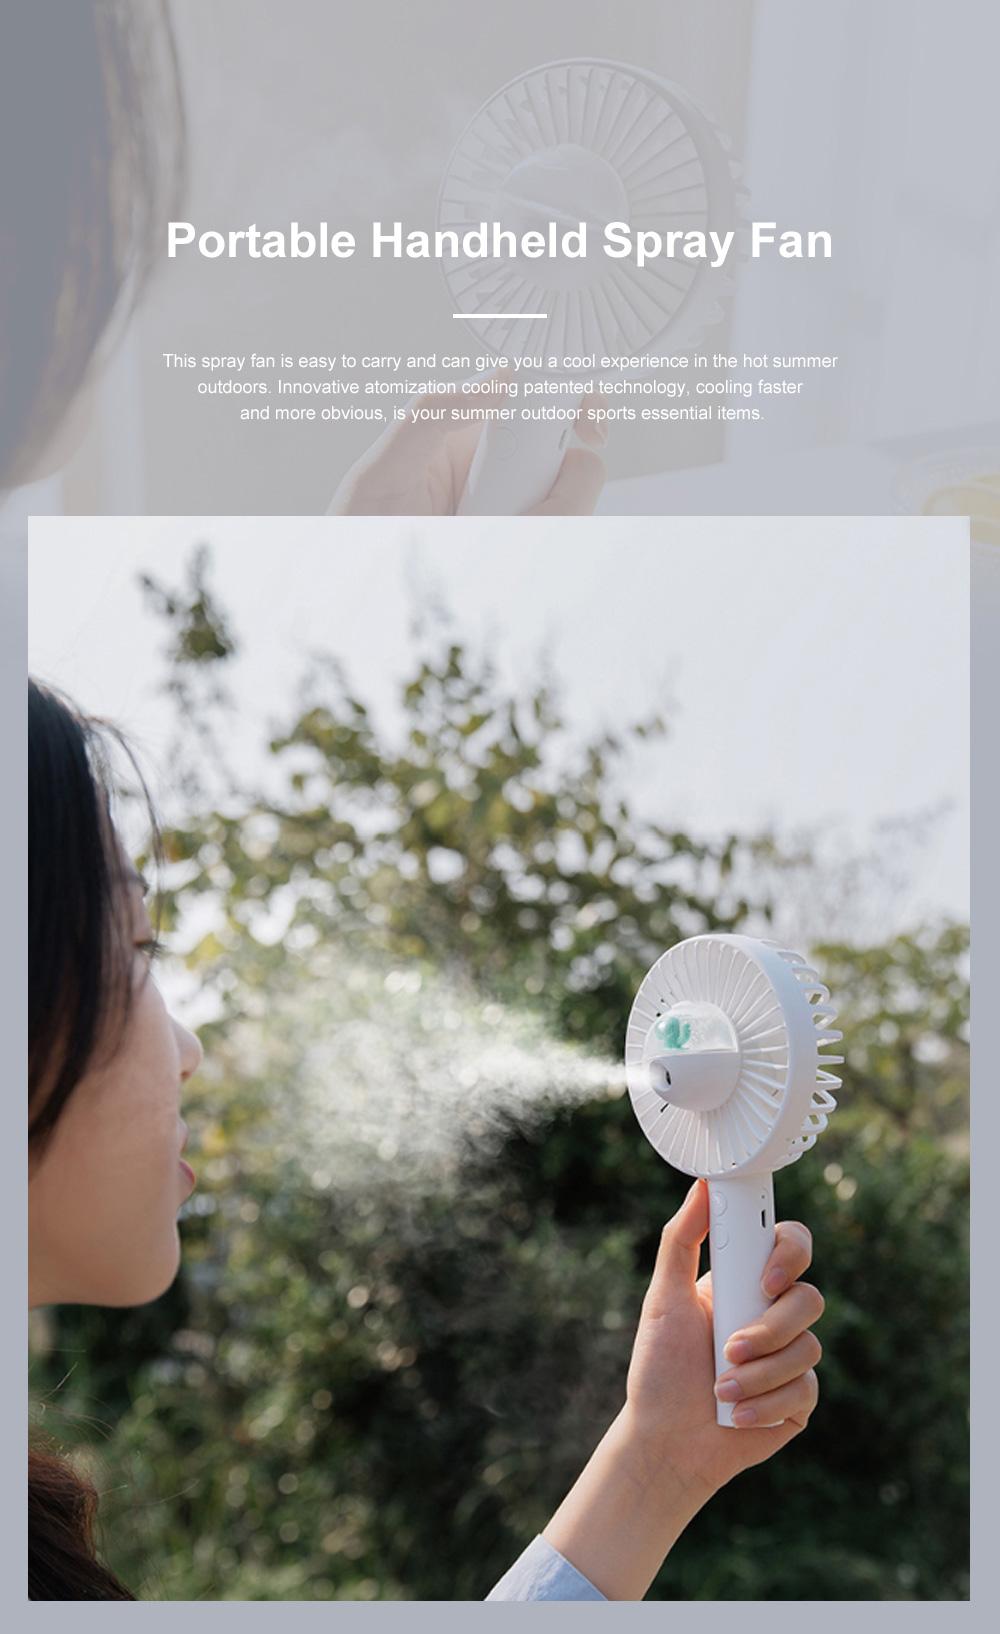 Portable Handheld Fan Cartoon Air Moistening Spray Fan Outdoor Portable Handheld Fan Creative Mini USB Cooler for Summer 0